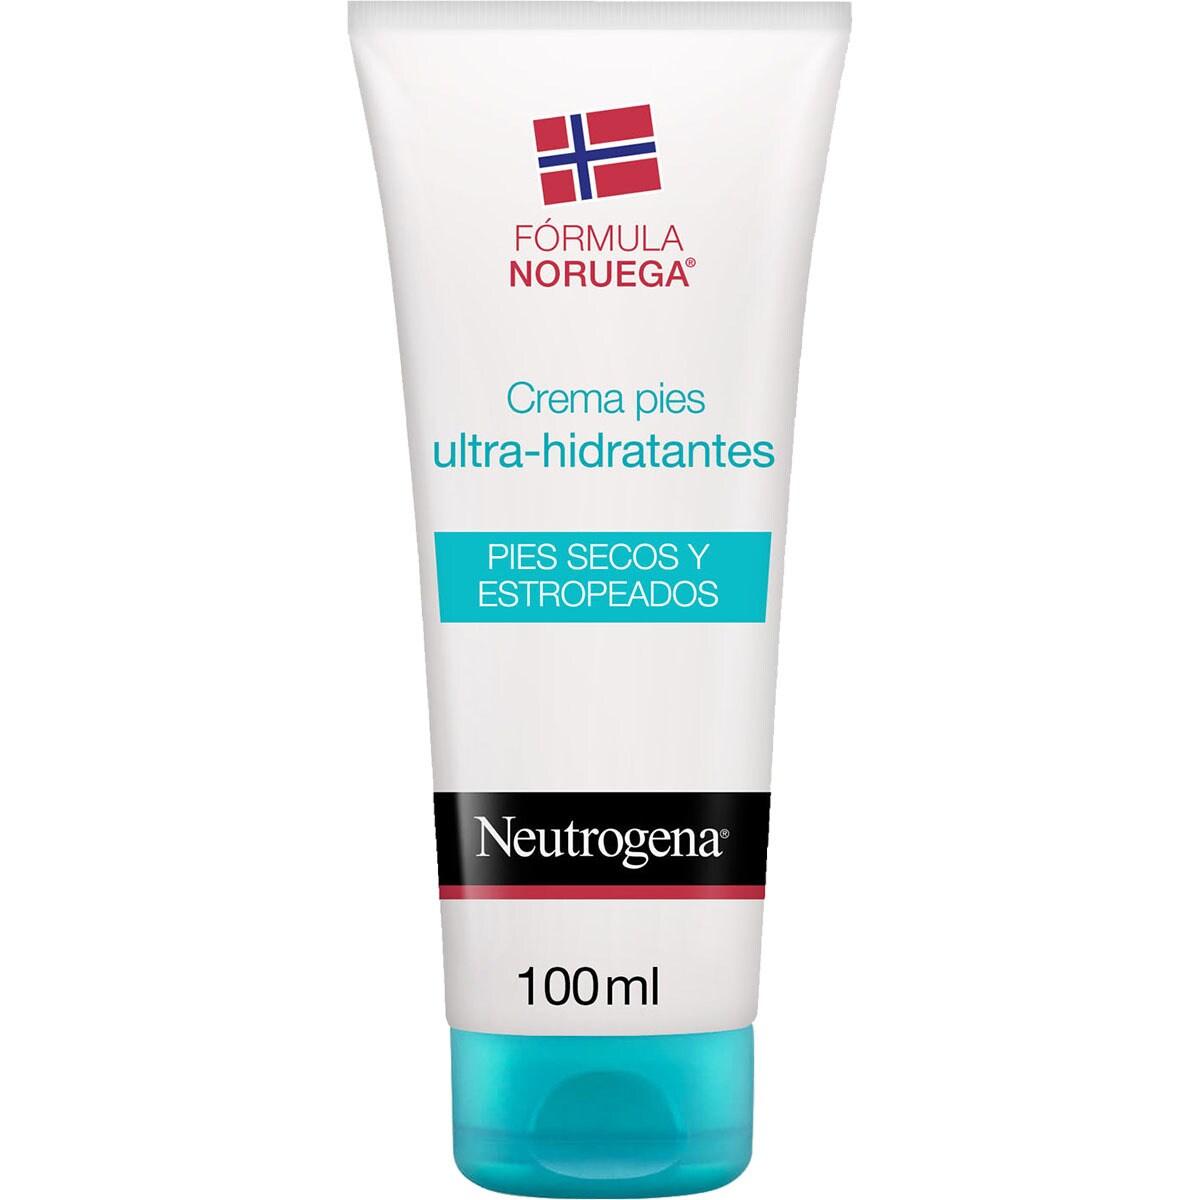 NEUTROGENA Crema para los pies Ultra-Hidratante tubo 100 ml